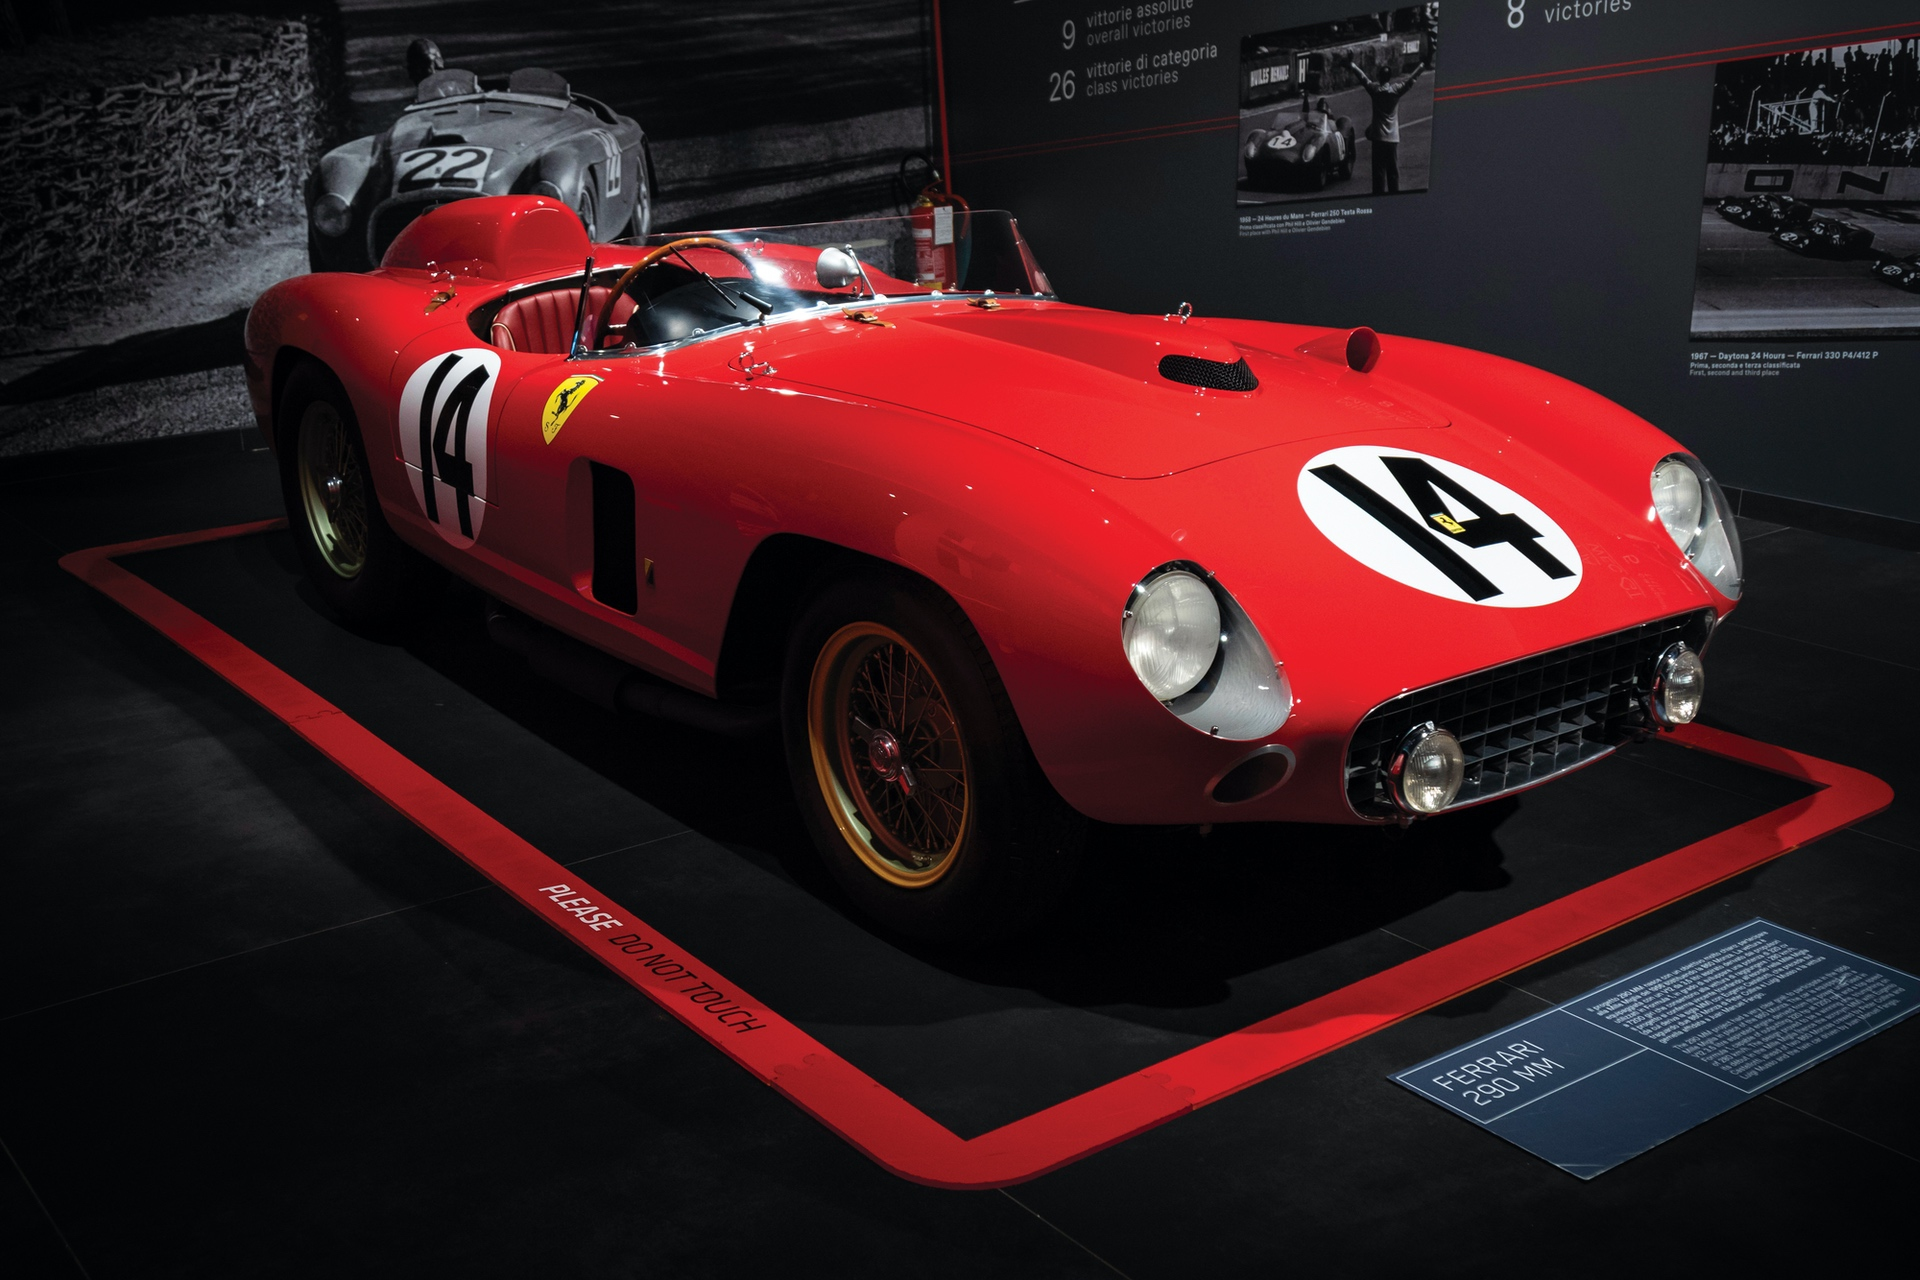 1956-Ferrari-290-MM-by-Scaglietti_1